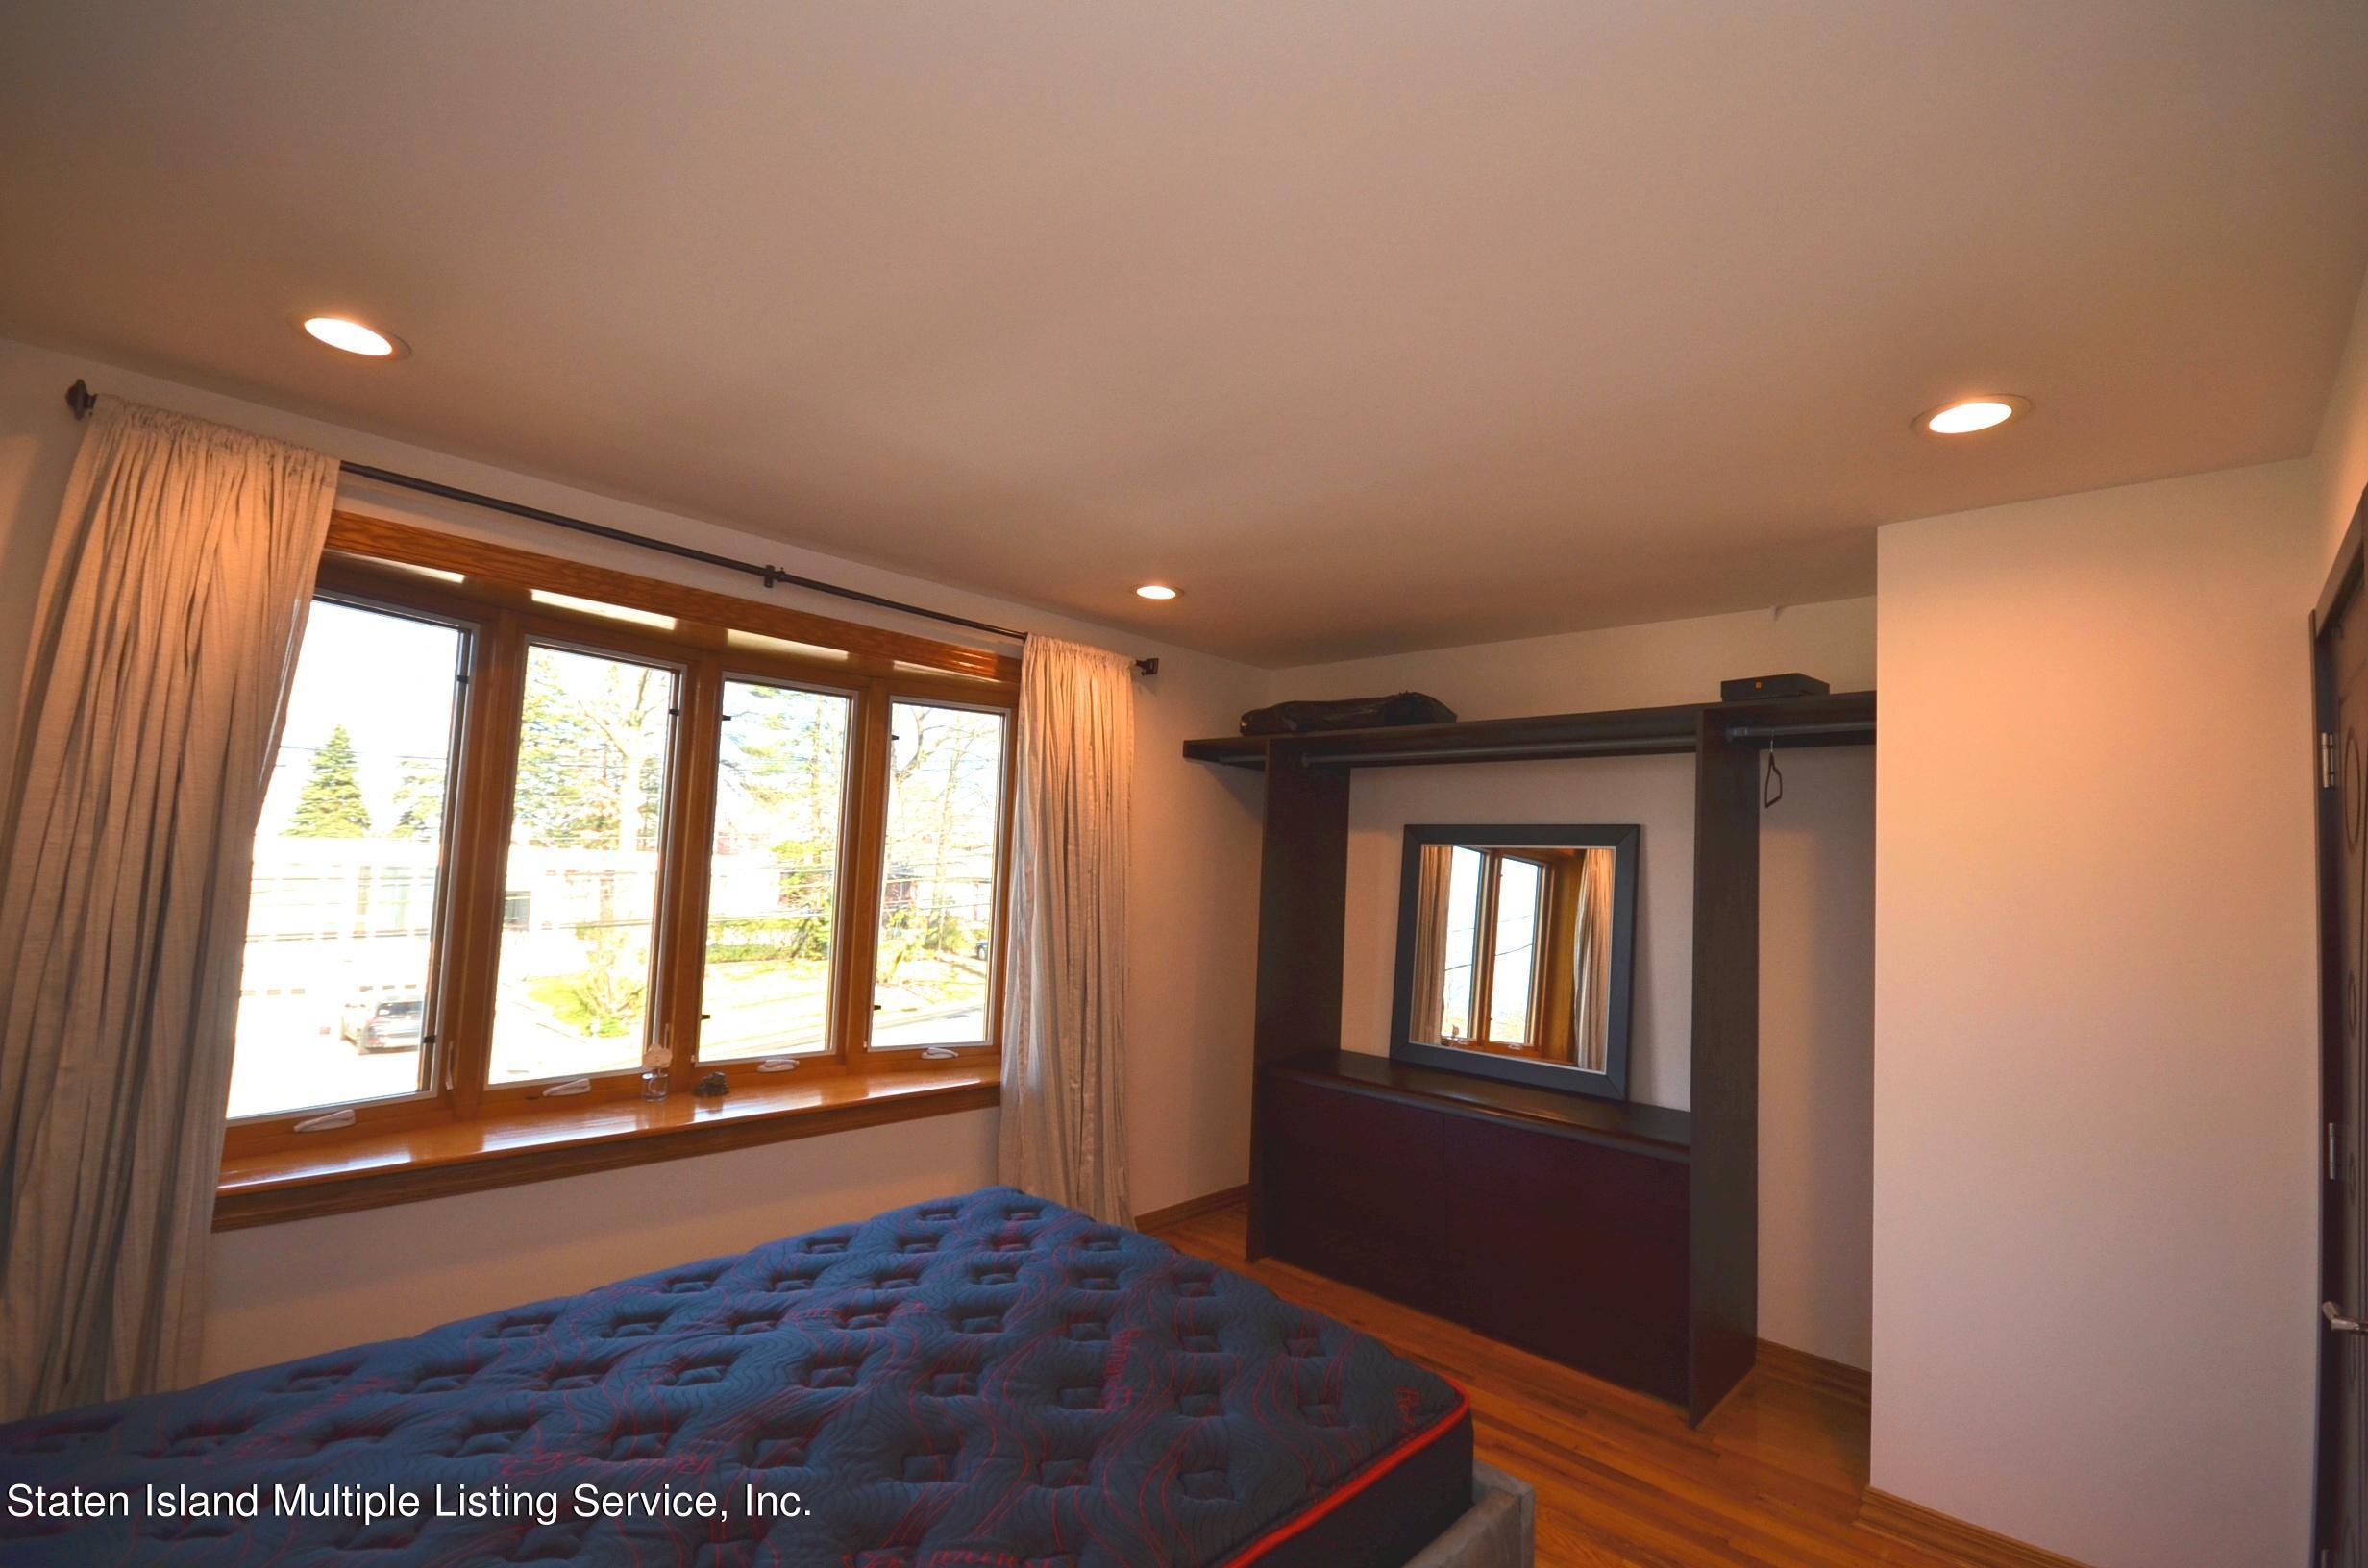 Single Family - Detached 48 Ocean Terrace  Staten Island, NY 10314, MLS-1142240-23